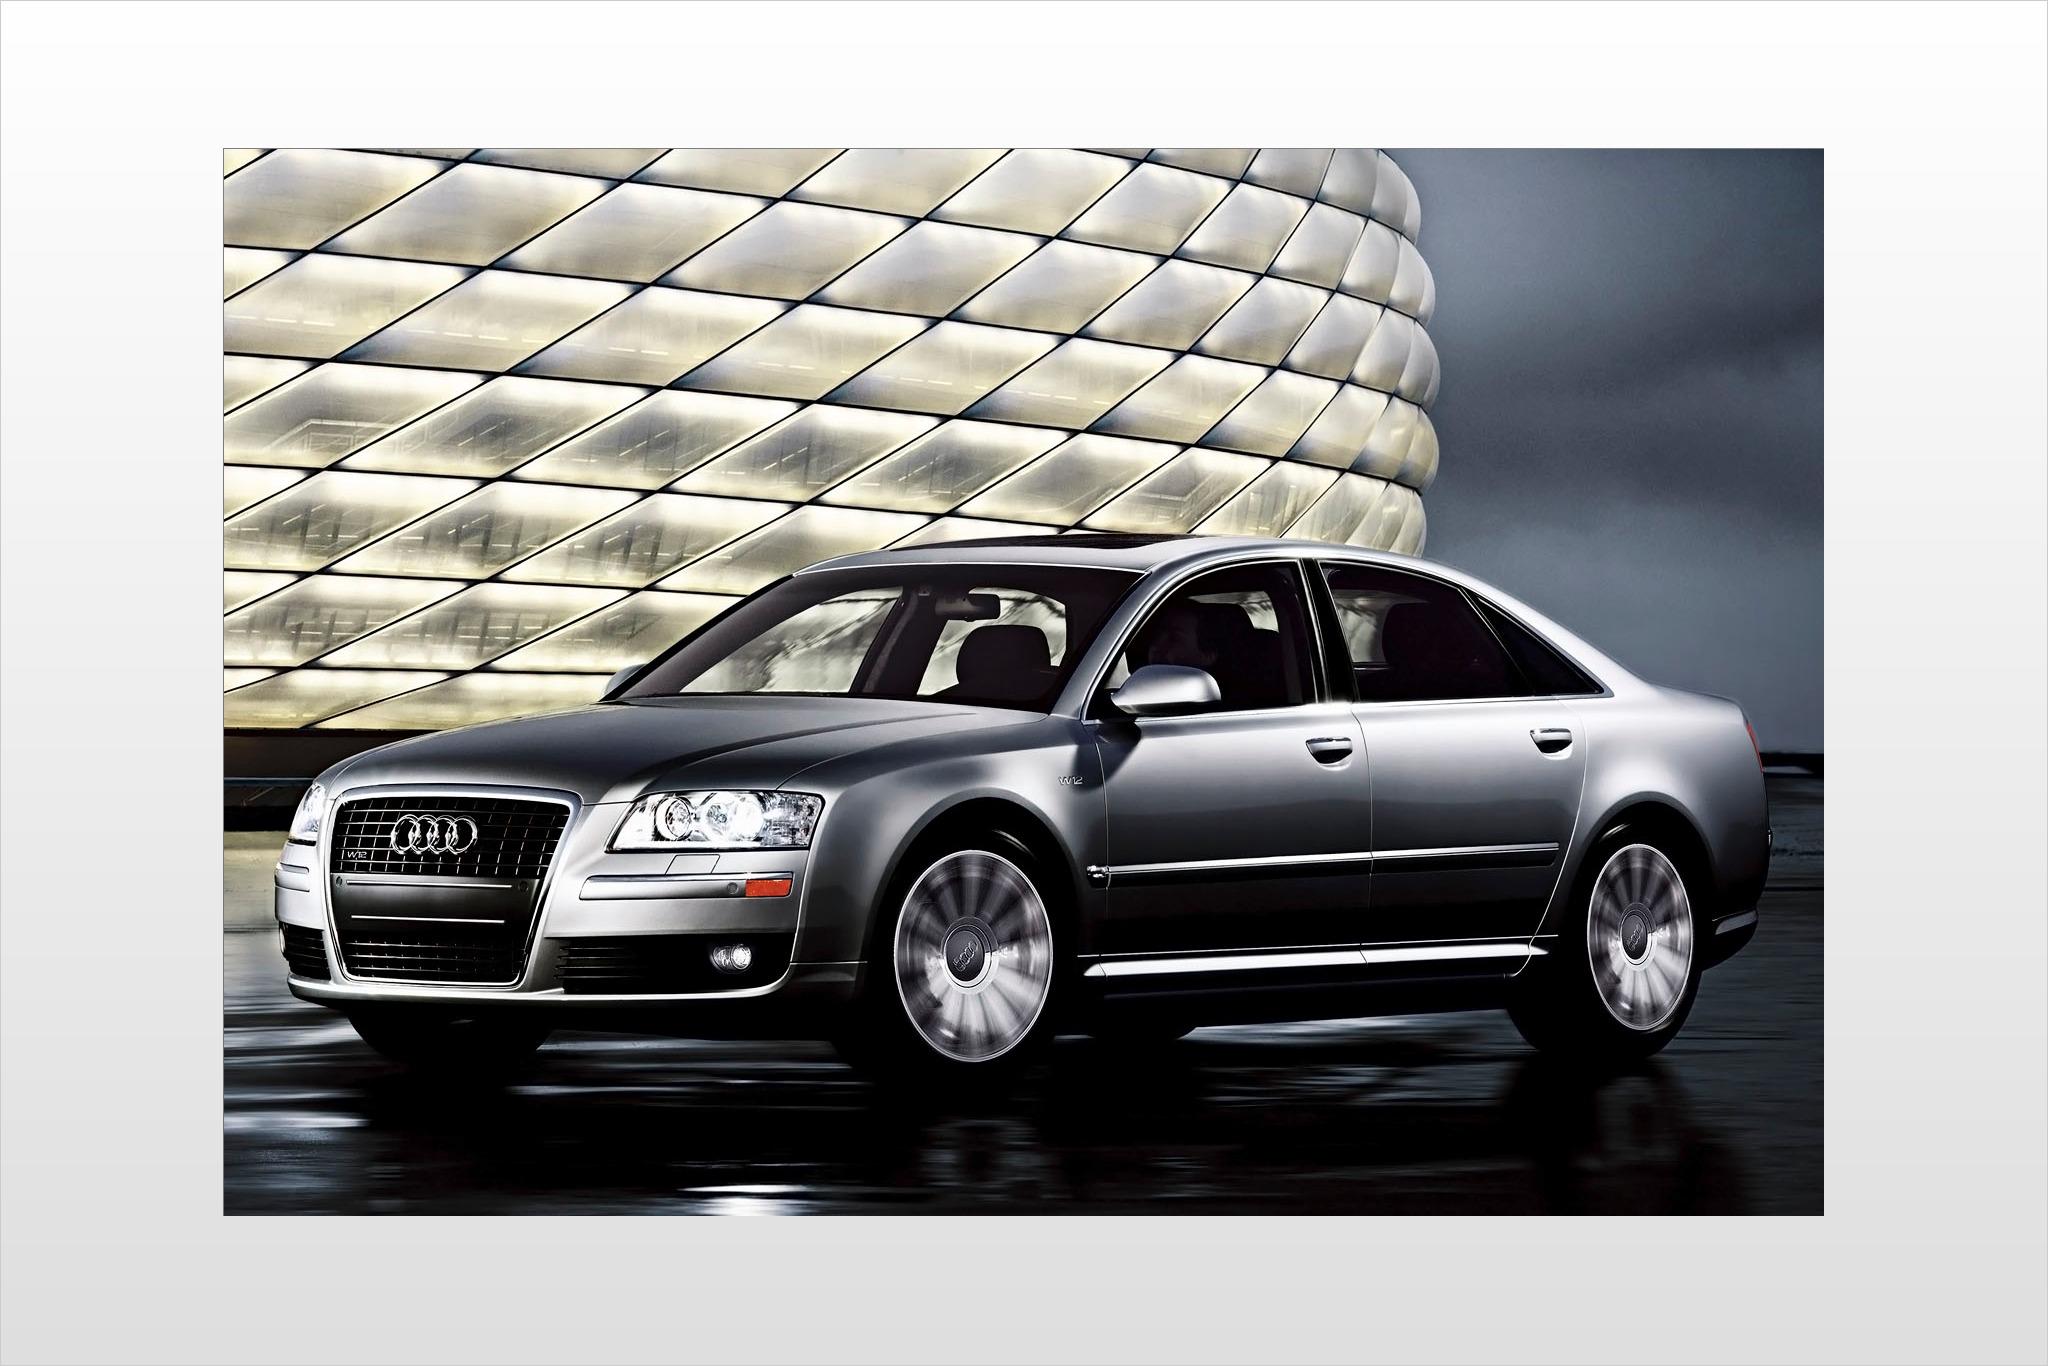 2007 Audi A8 Image 1